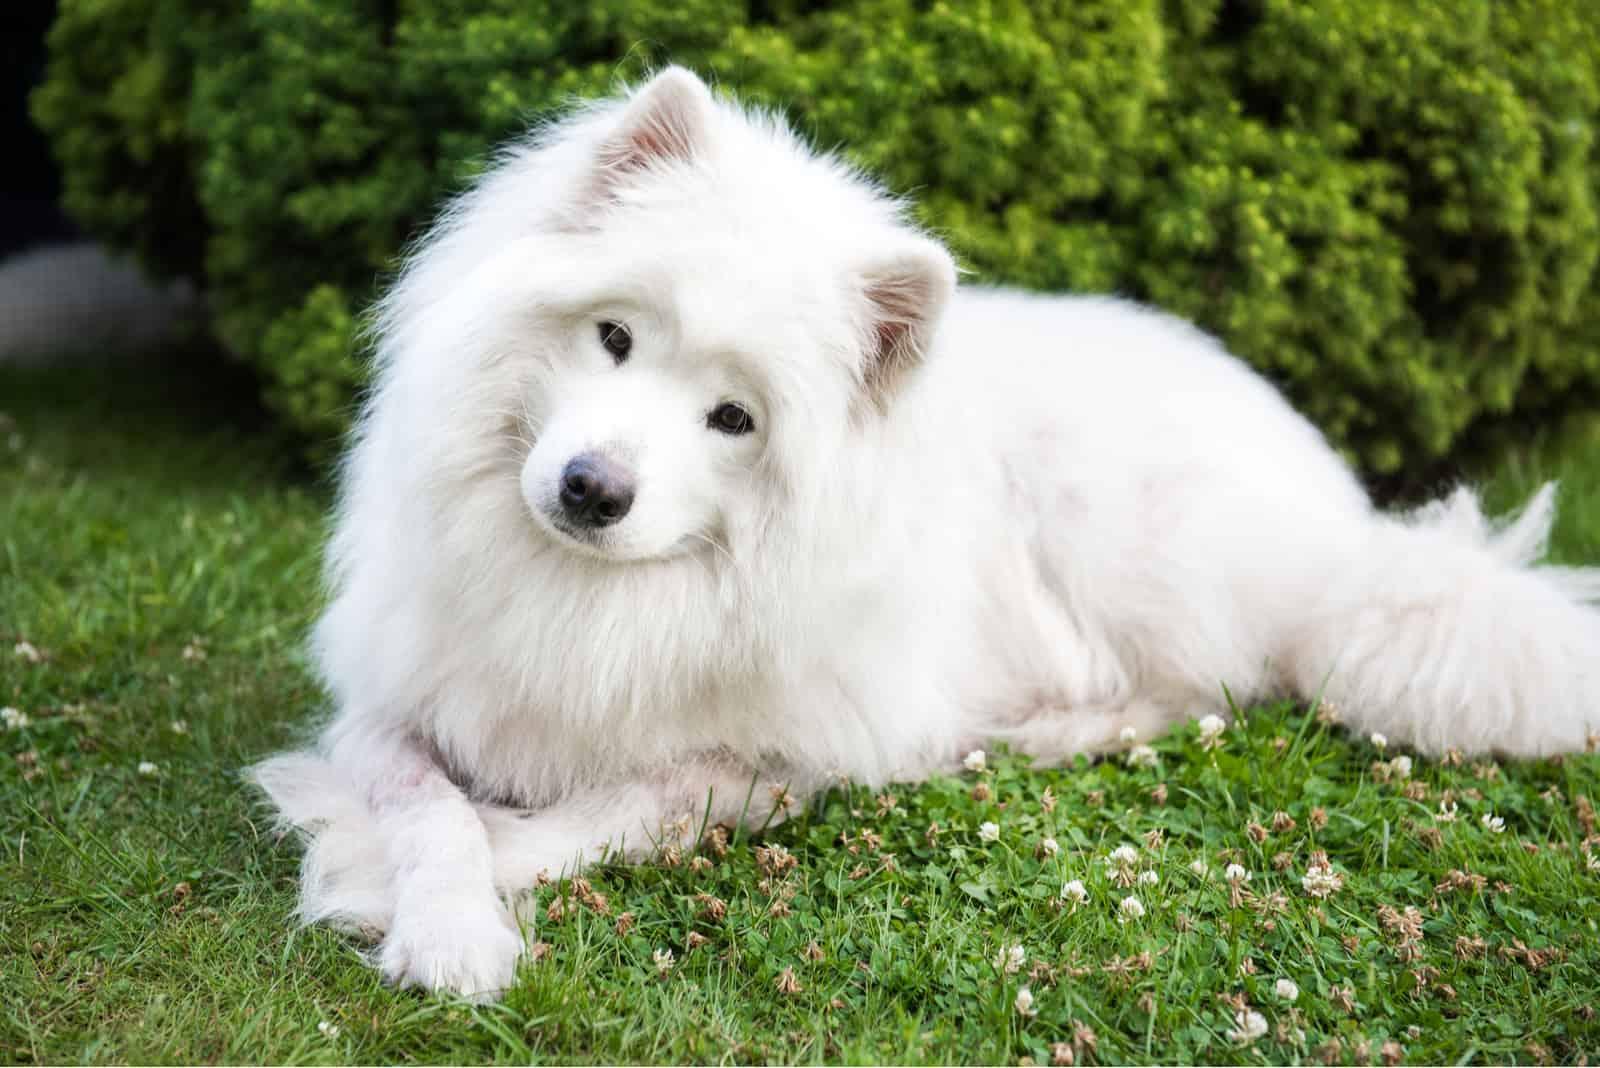 Big white dog with fluffy hair of Samoyed breed